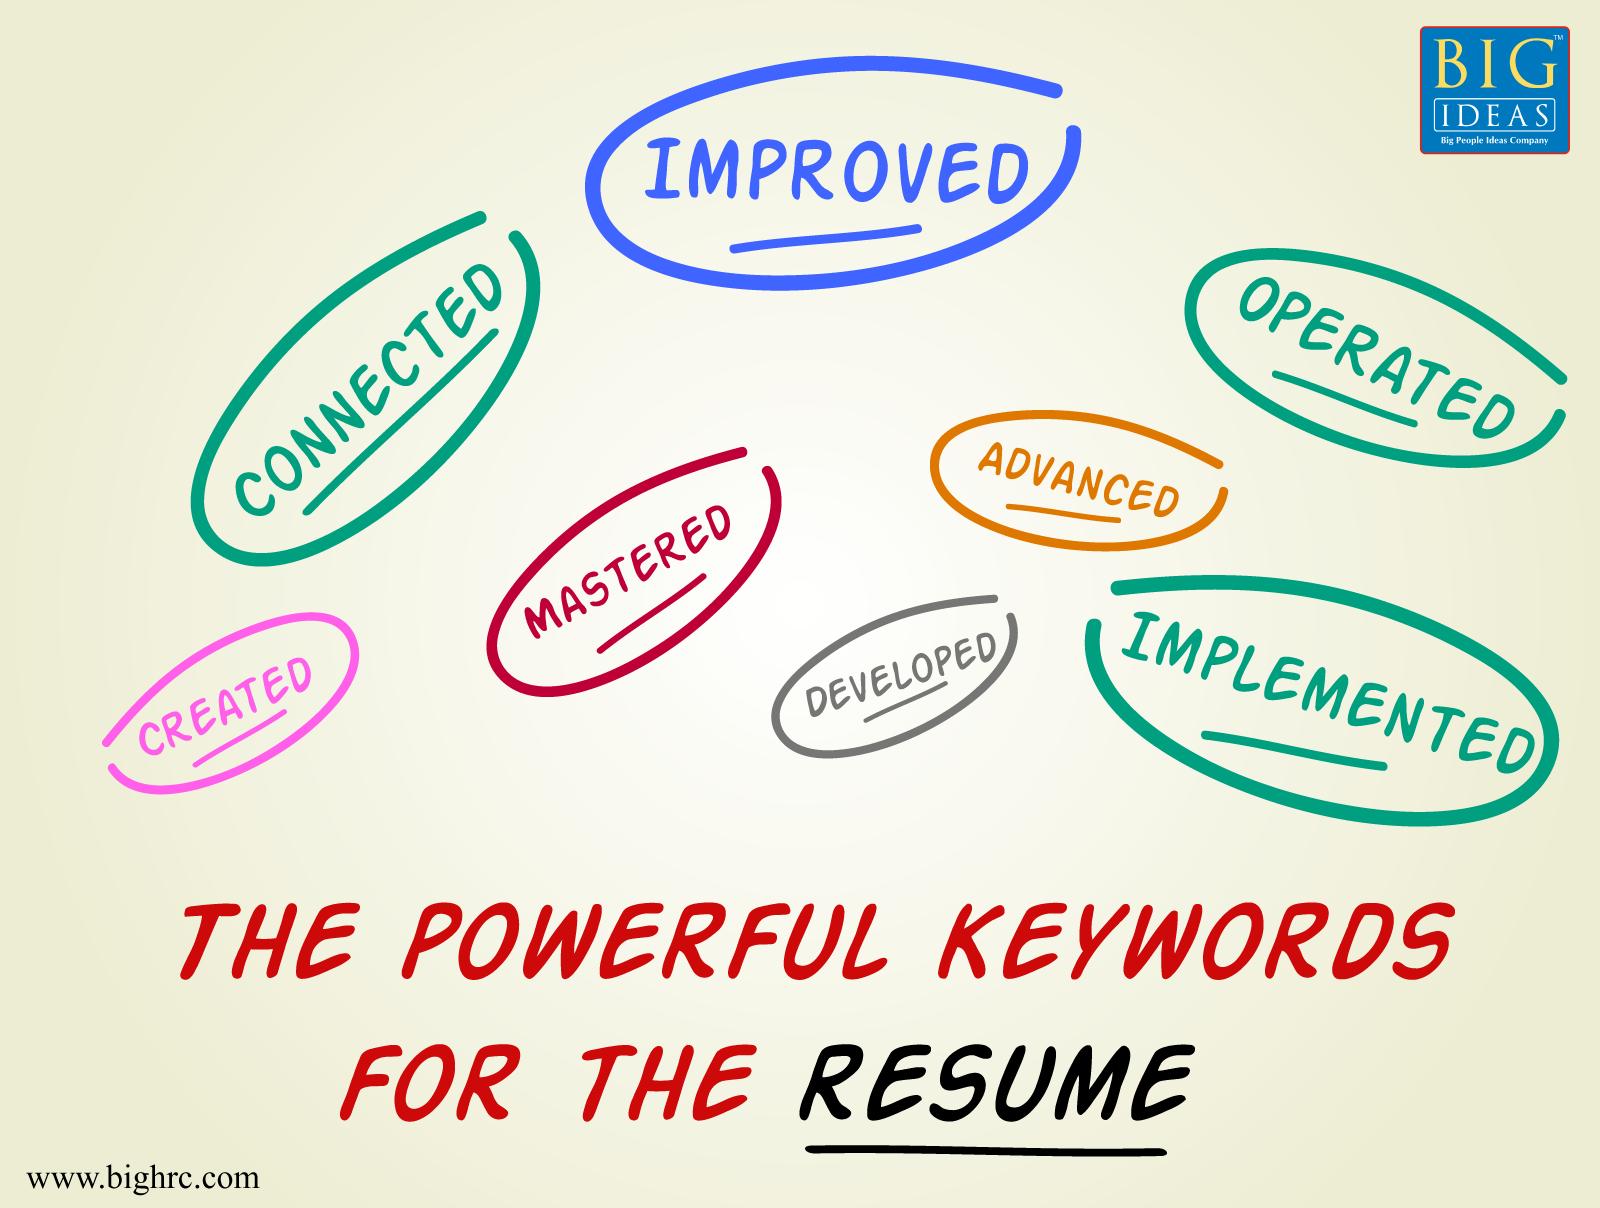 The powerful keywords for the resume. BigIdeasHR Social